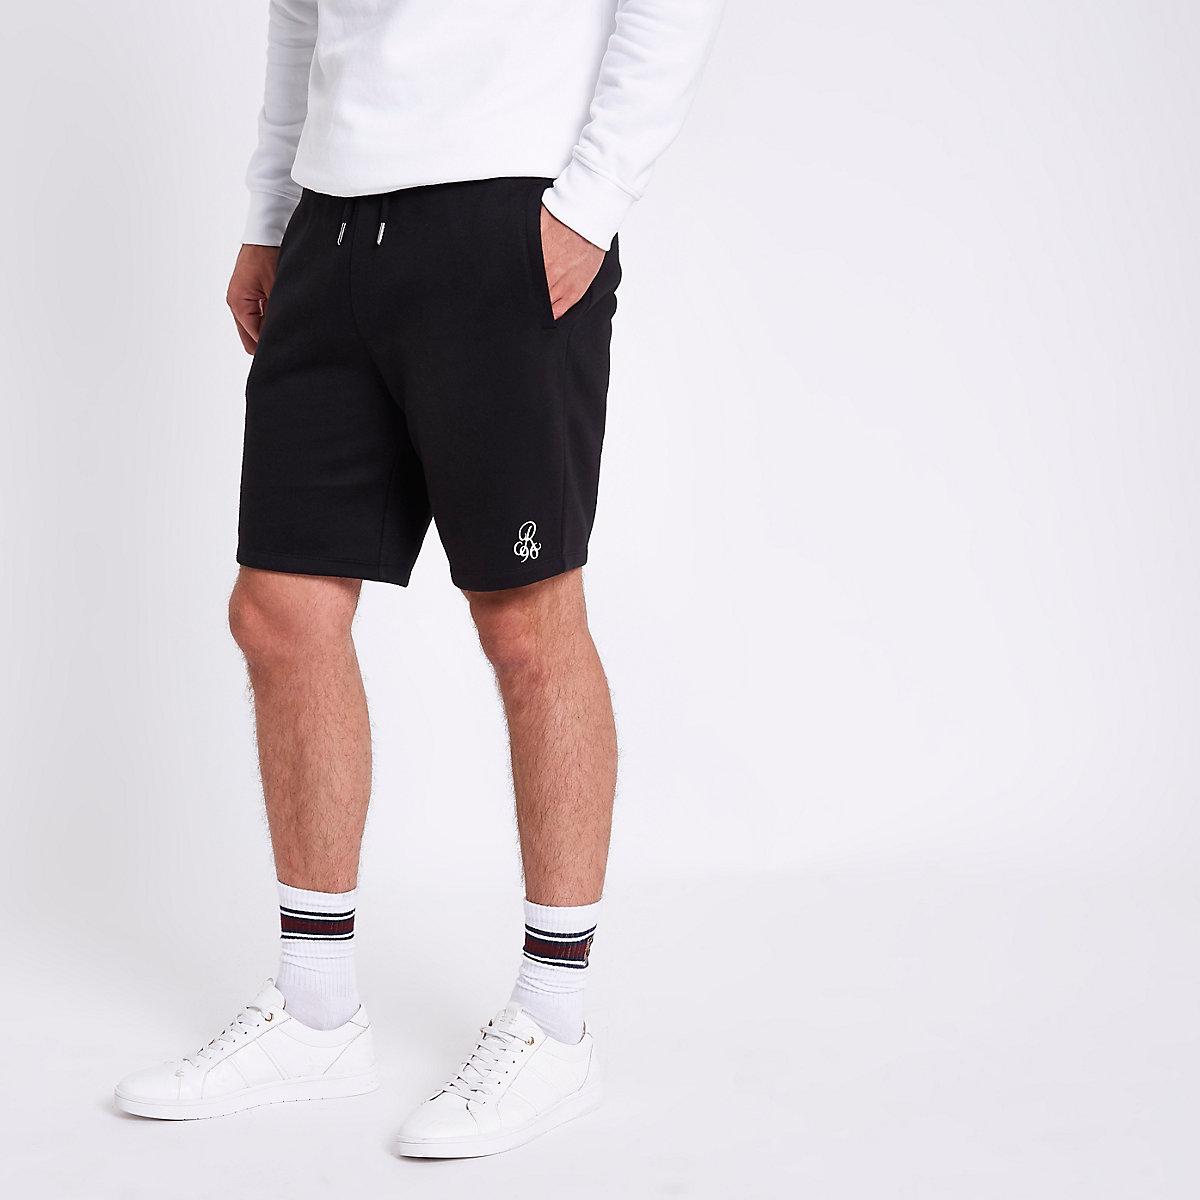 Black R96 slim fit fleece shorts